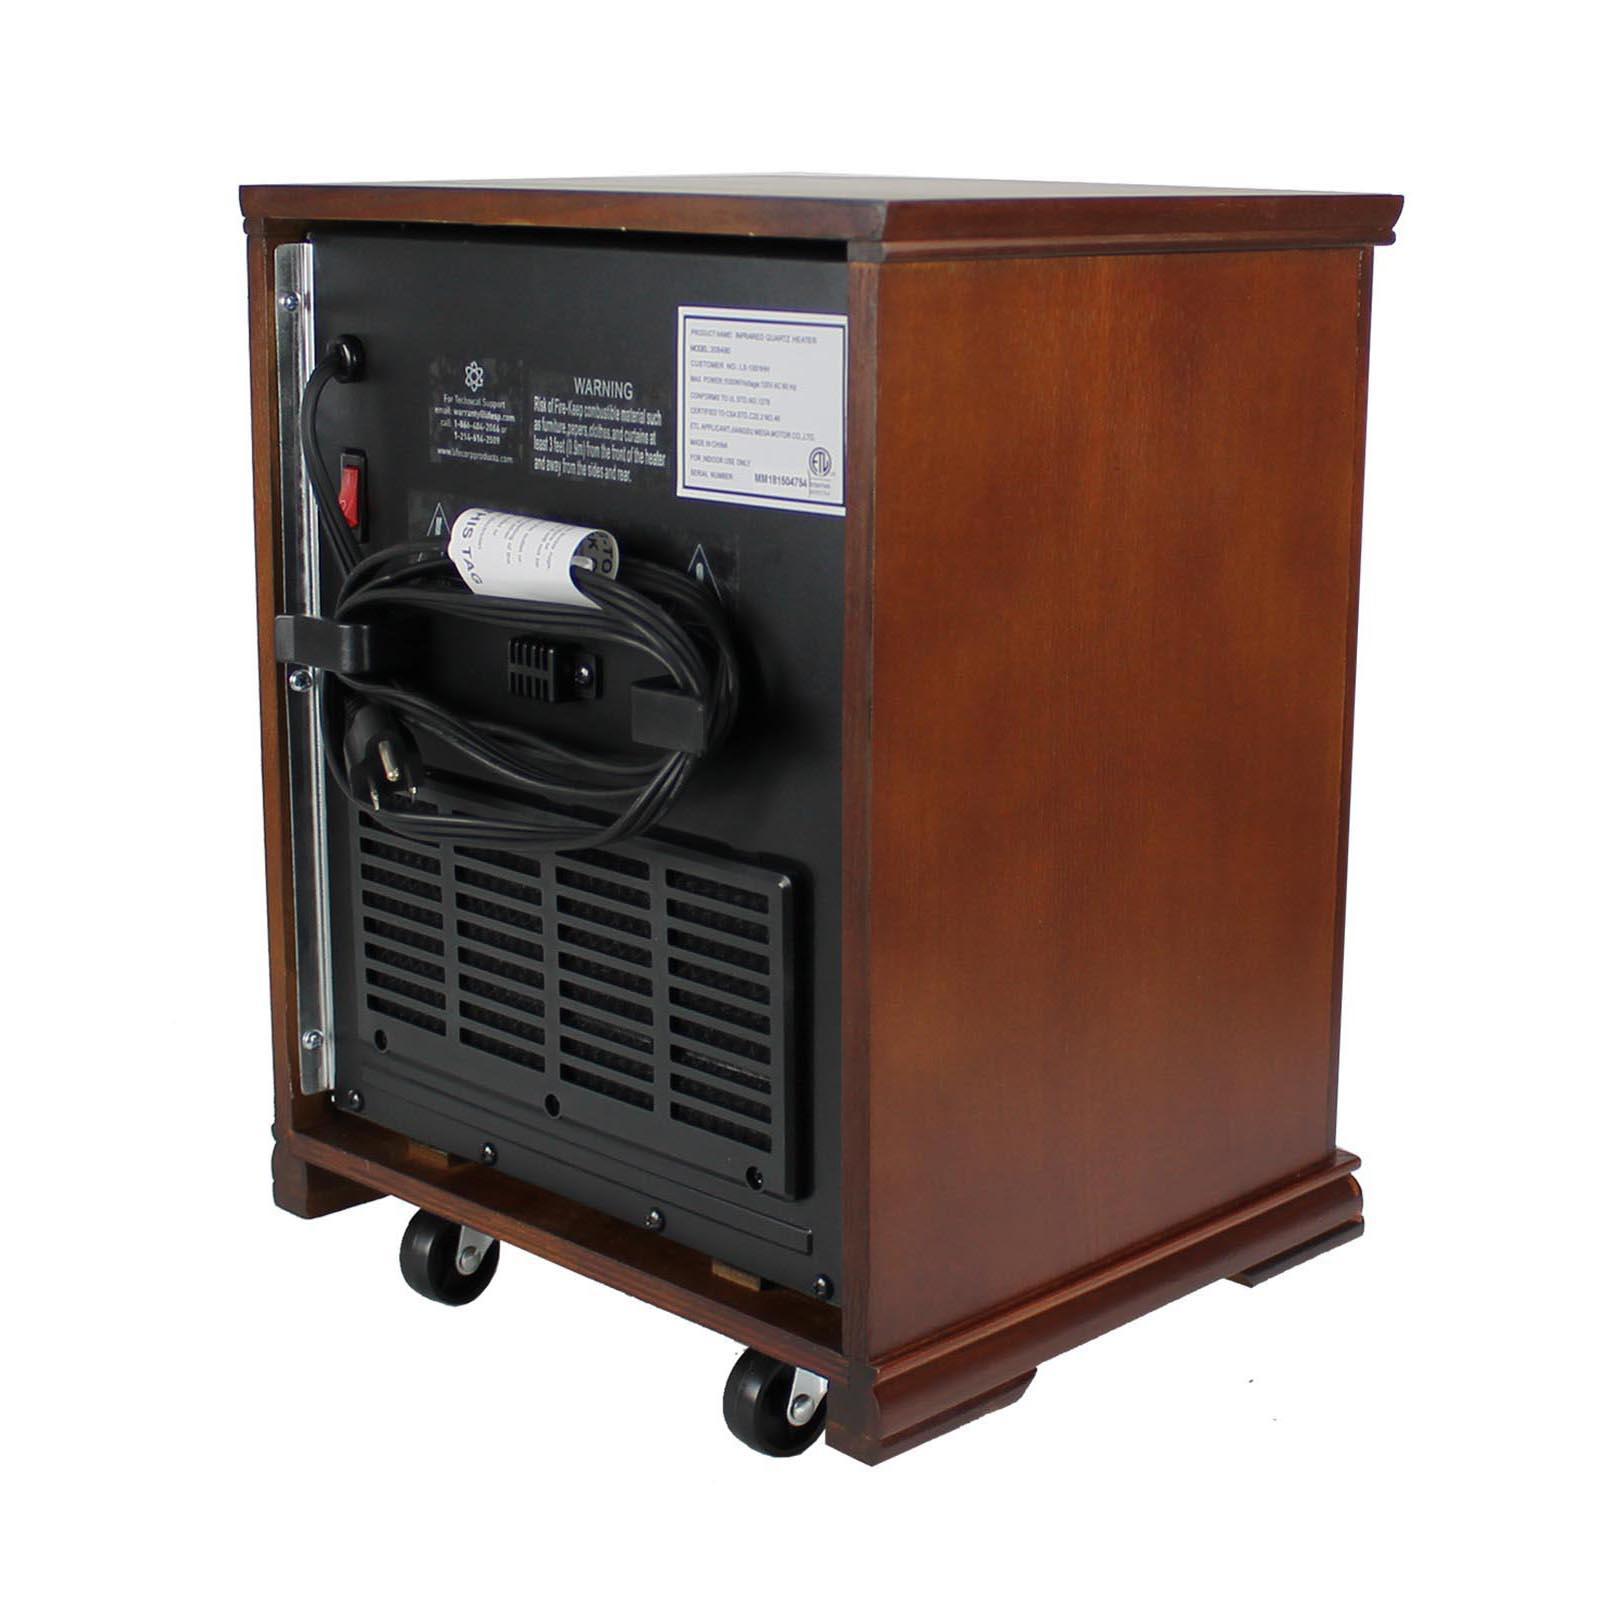 Lifesmart Lifepro Dark Oak 1500 Watt Infrared Electric